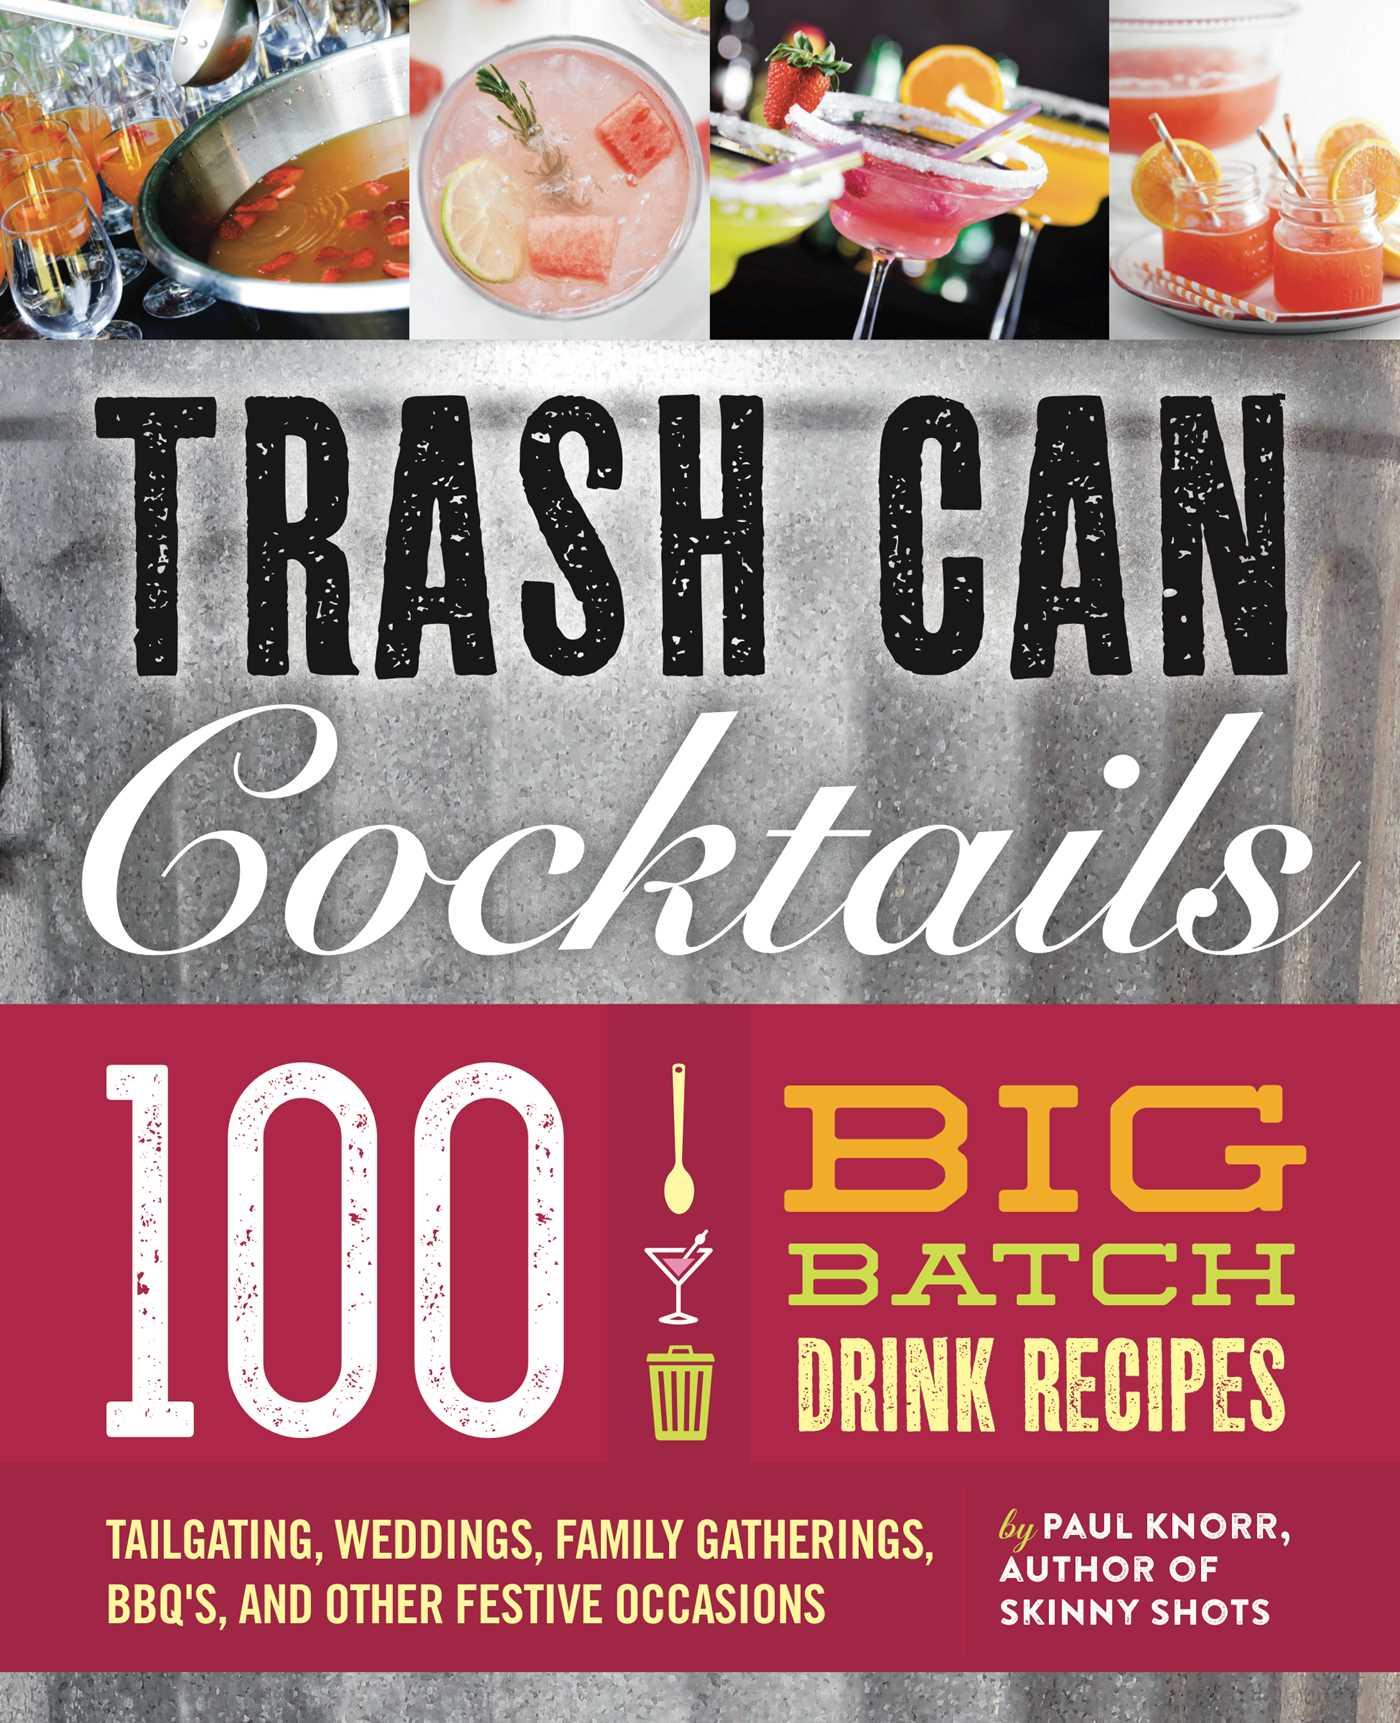 Big batch cocktails 9781604337235 hr